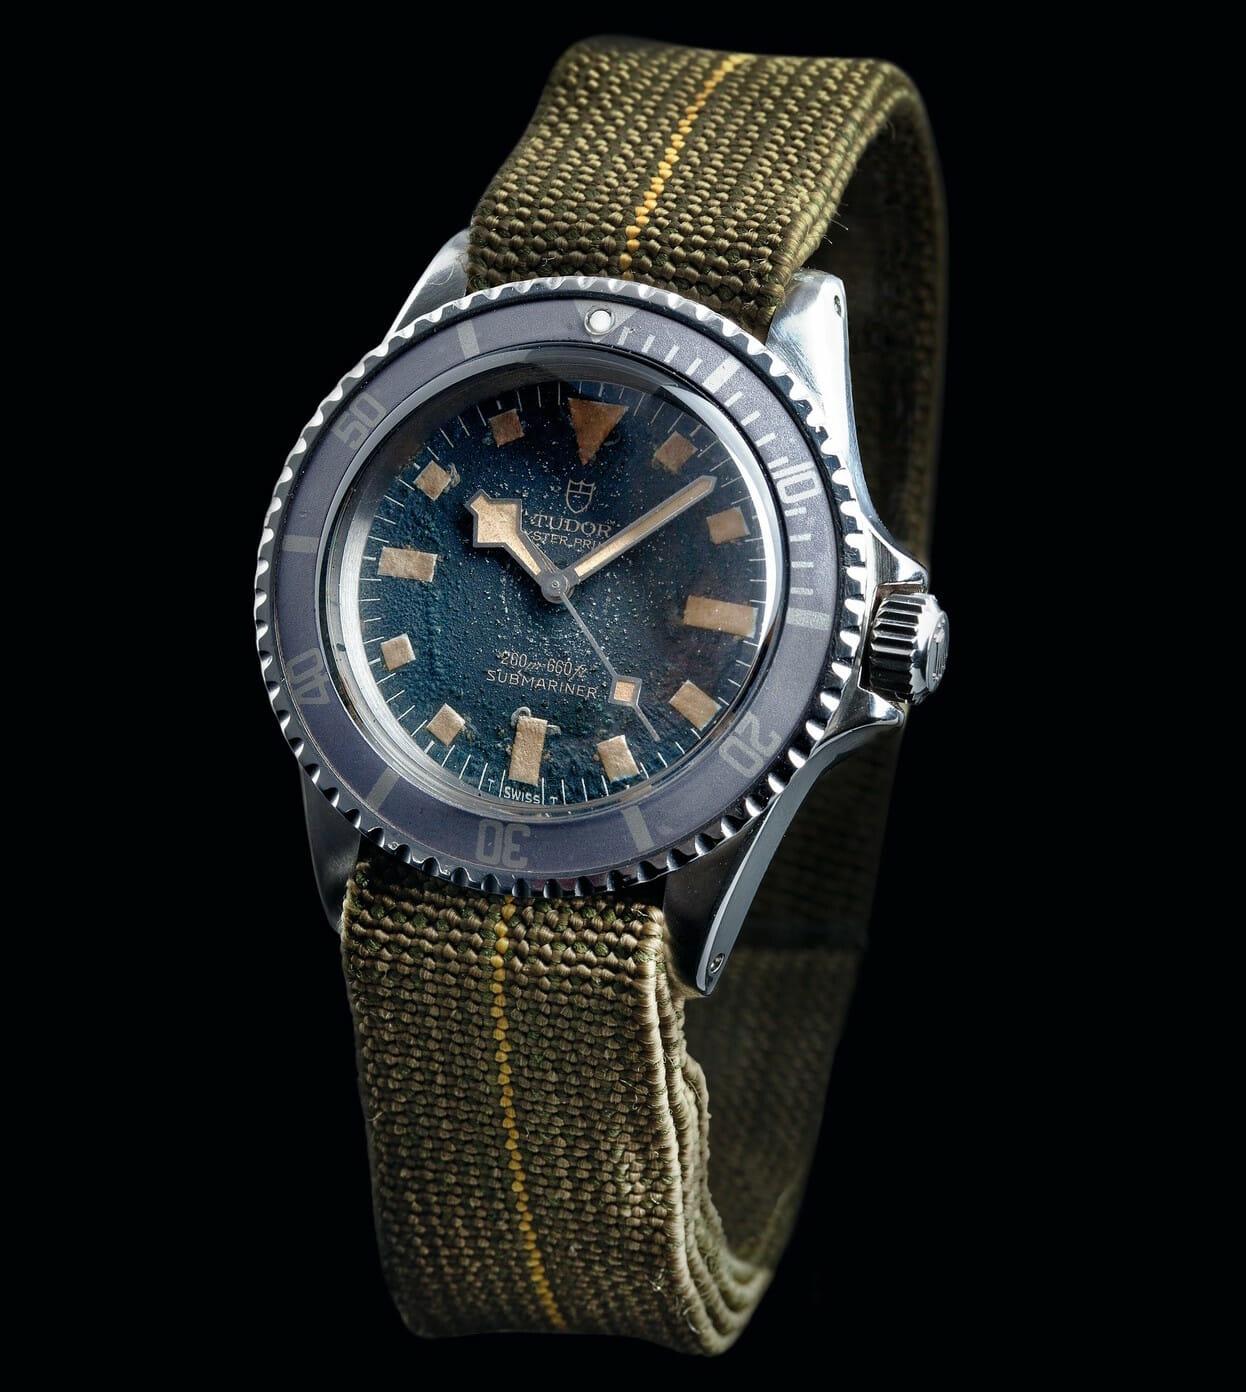 1977 Tudor Oyster Prince Submariner Marine Nationale Reference 9401